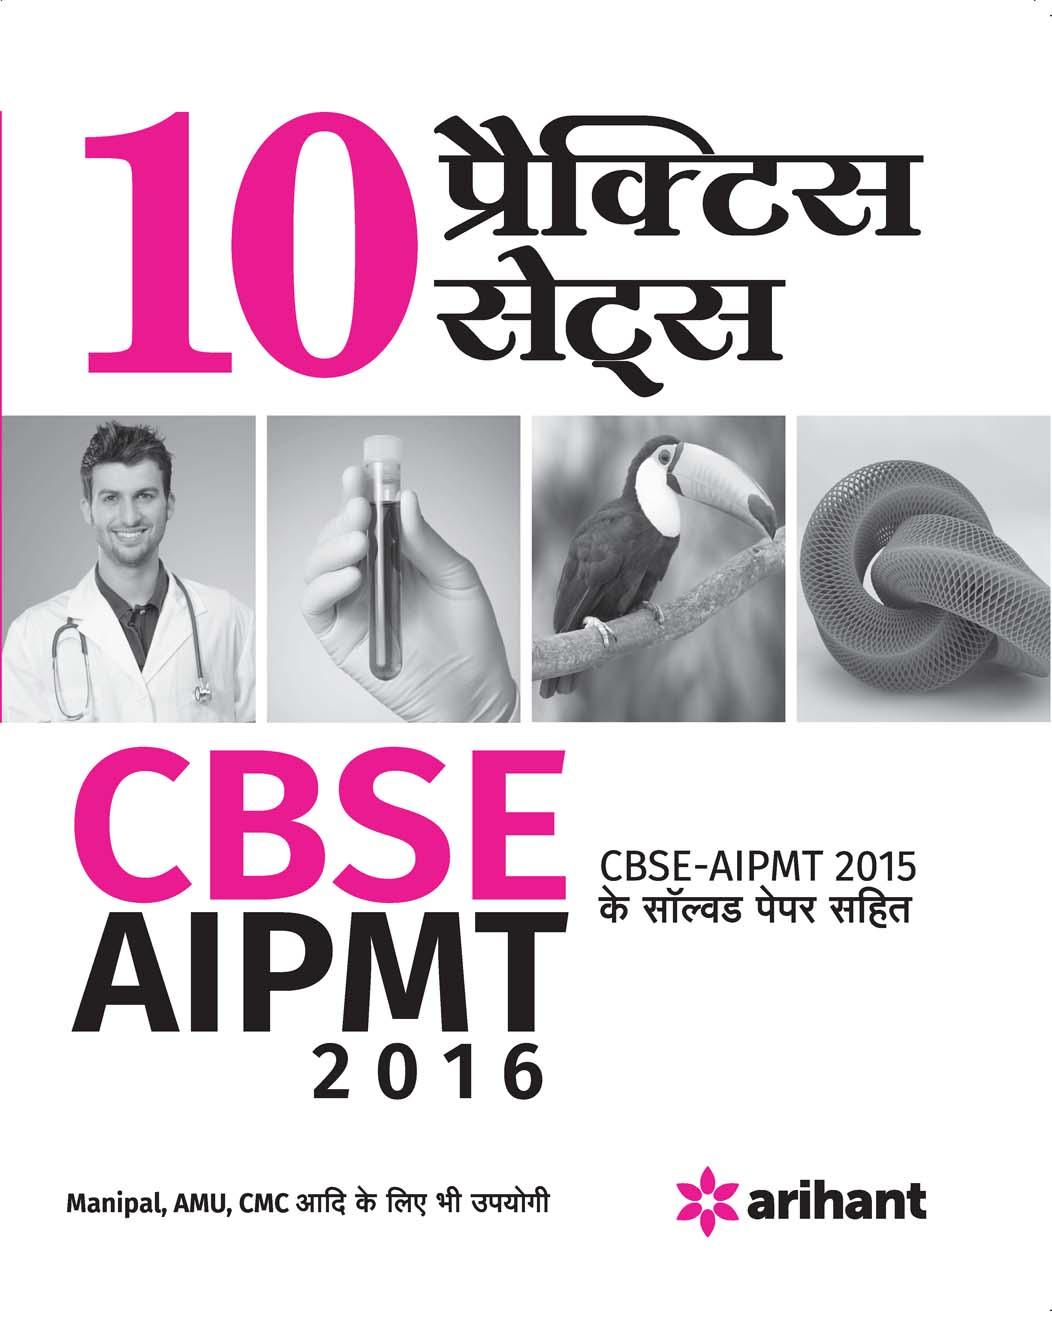 Taiyaar Ho Jayein PMTs 2016 ke Liye - 10 Pracitce Sets (Hindi) by Experts Compilation on Textnook.com